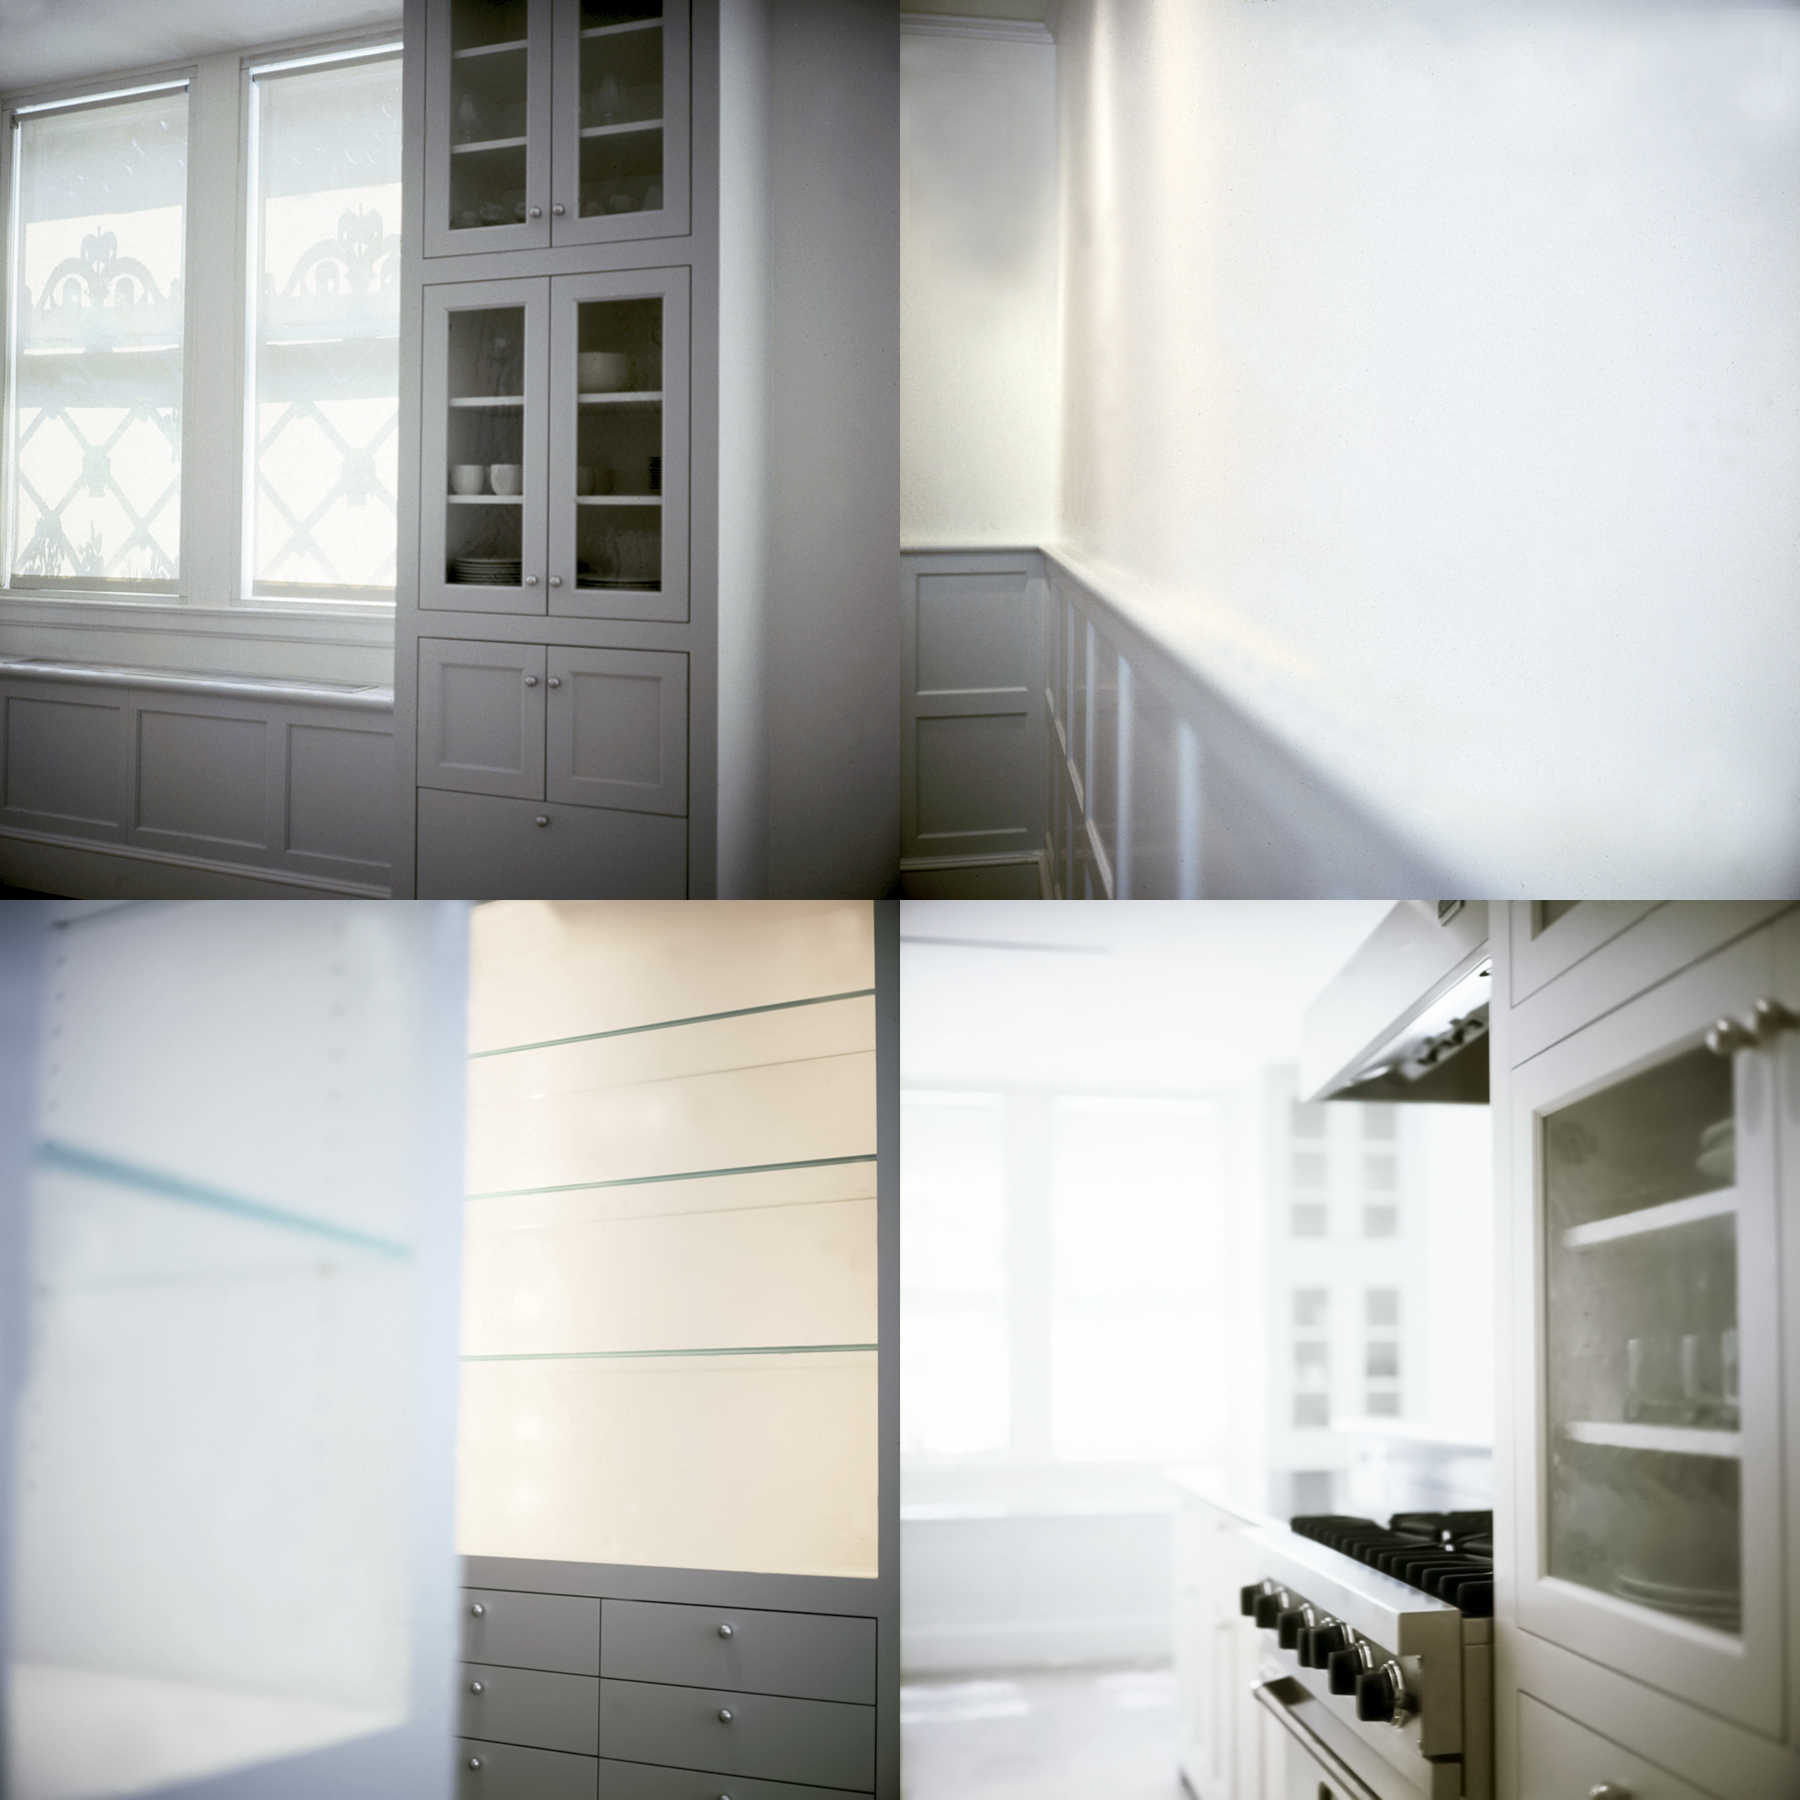 Lightroom (31.jpg and 3 others.JPG